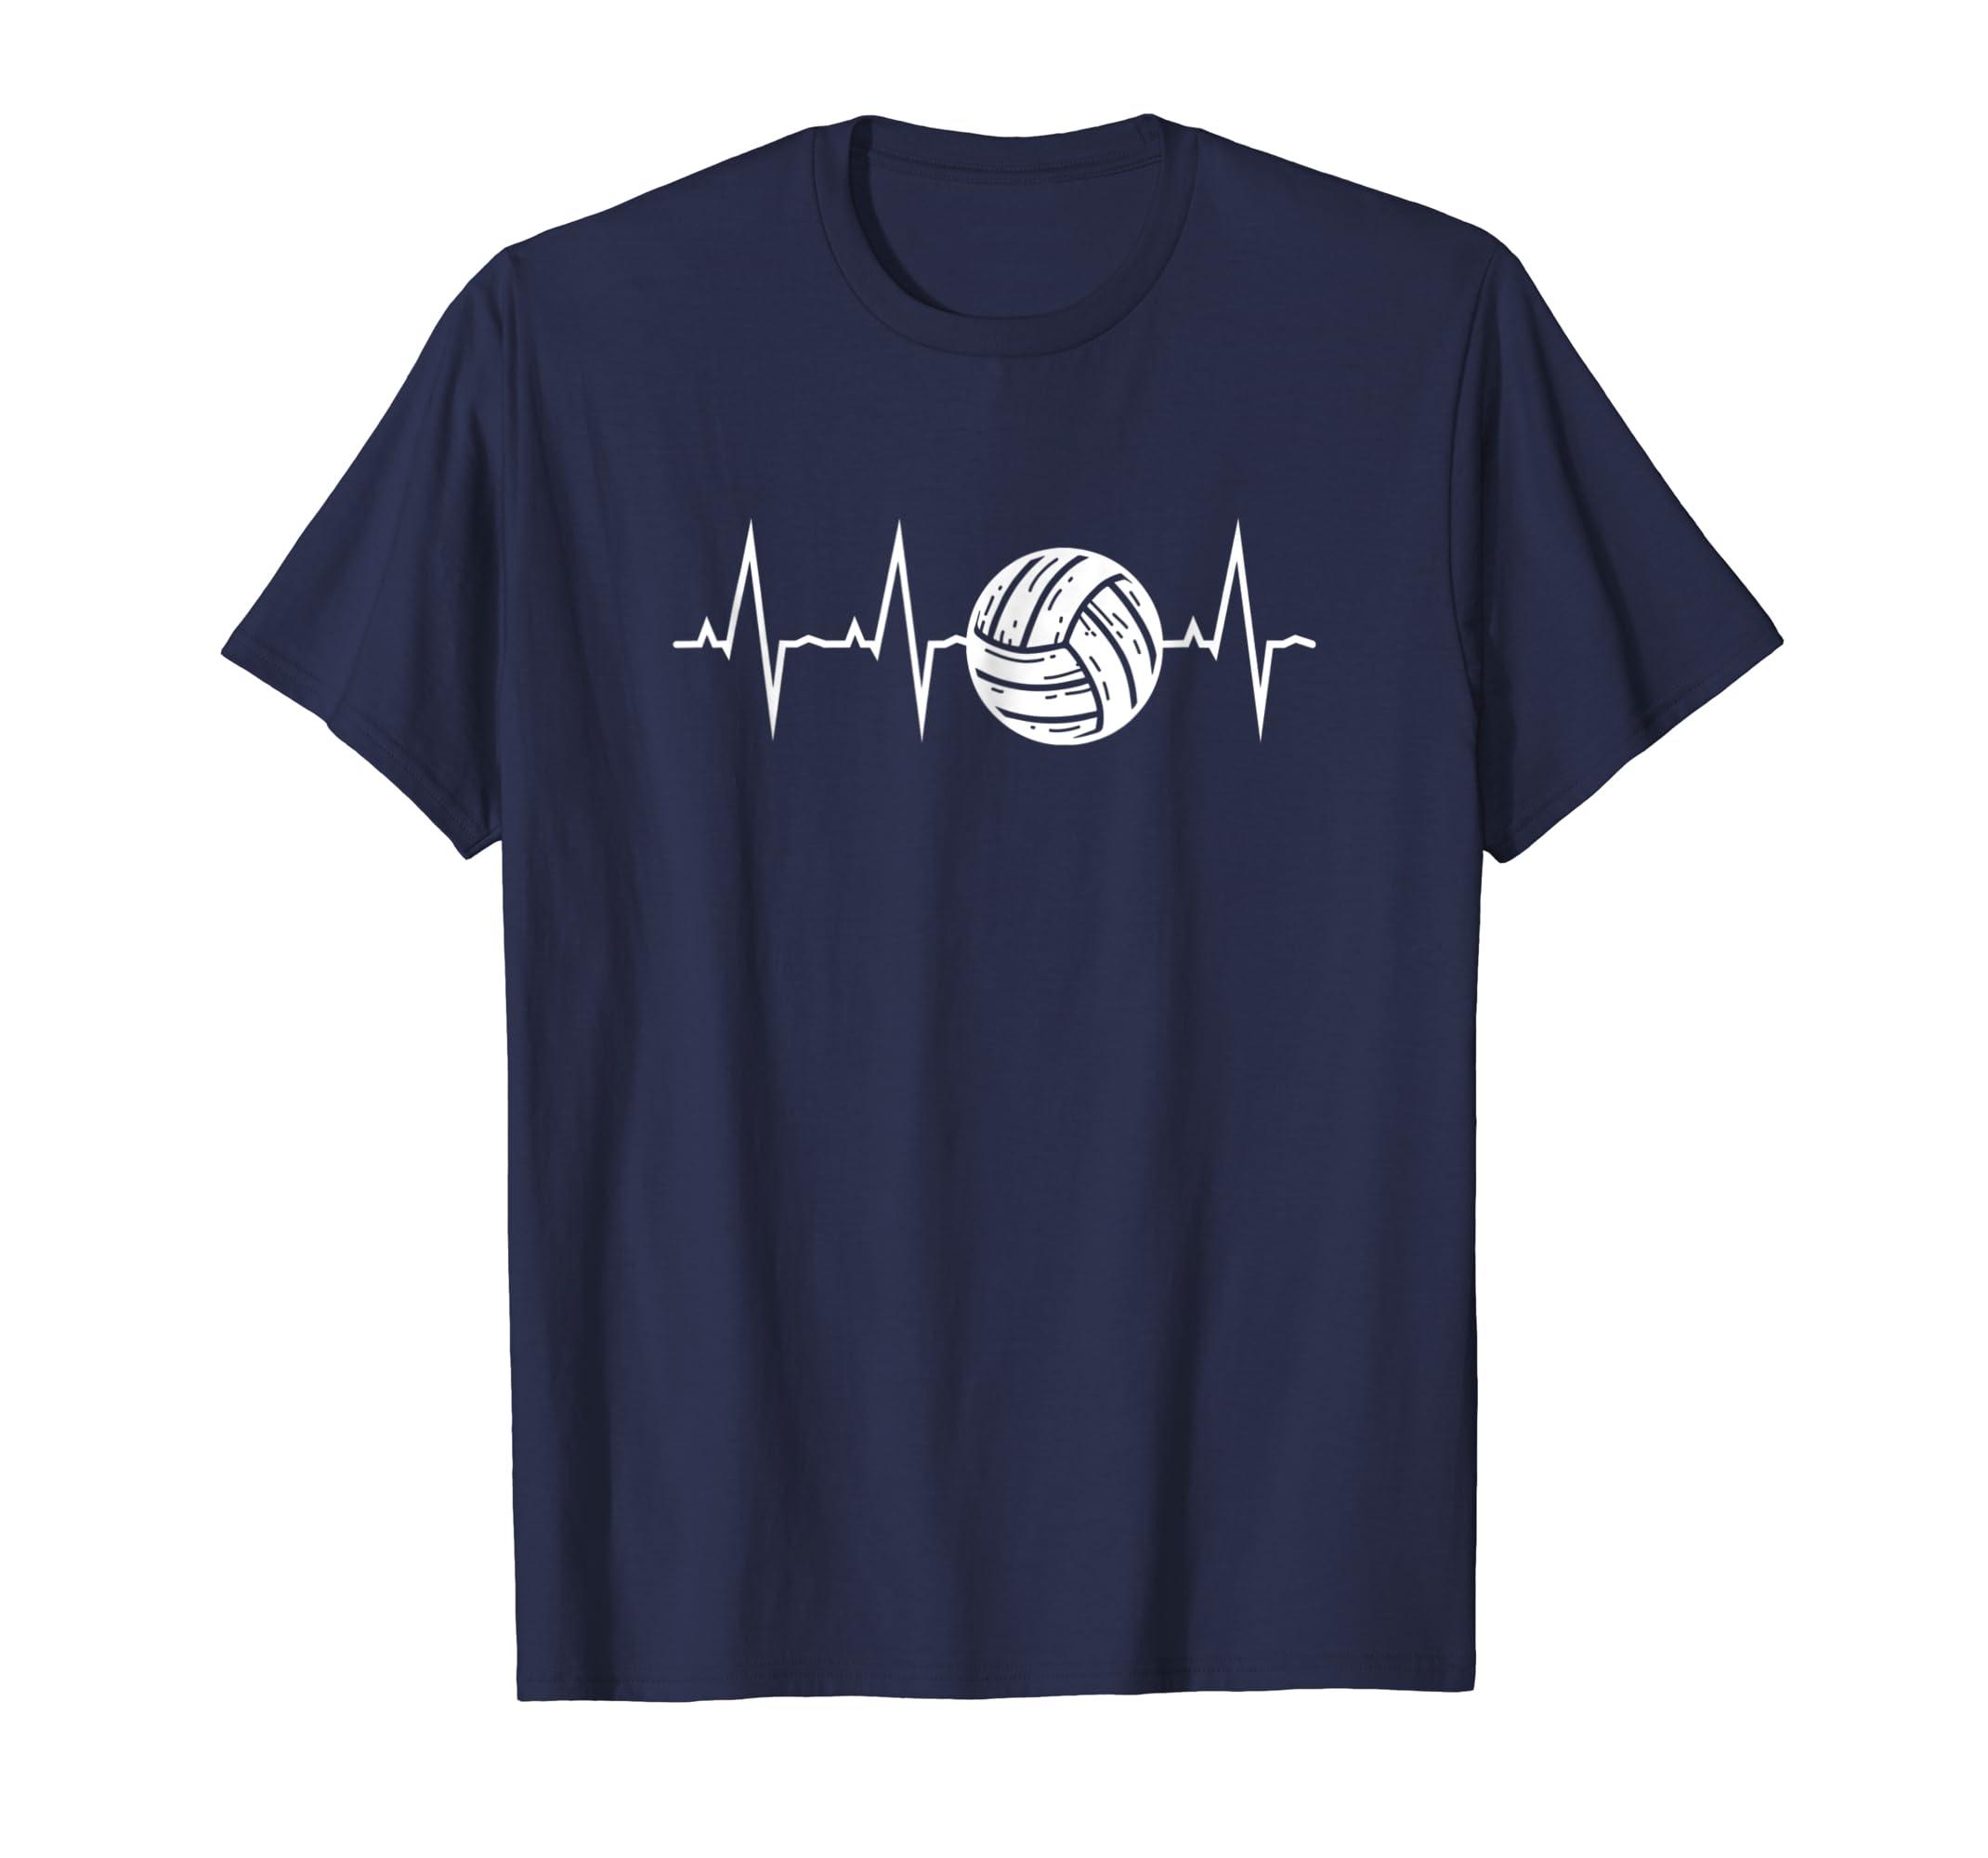 Volleyball Heartbeat Shirt Volleyball Shirts-azvn